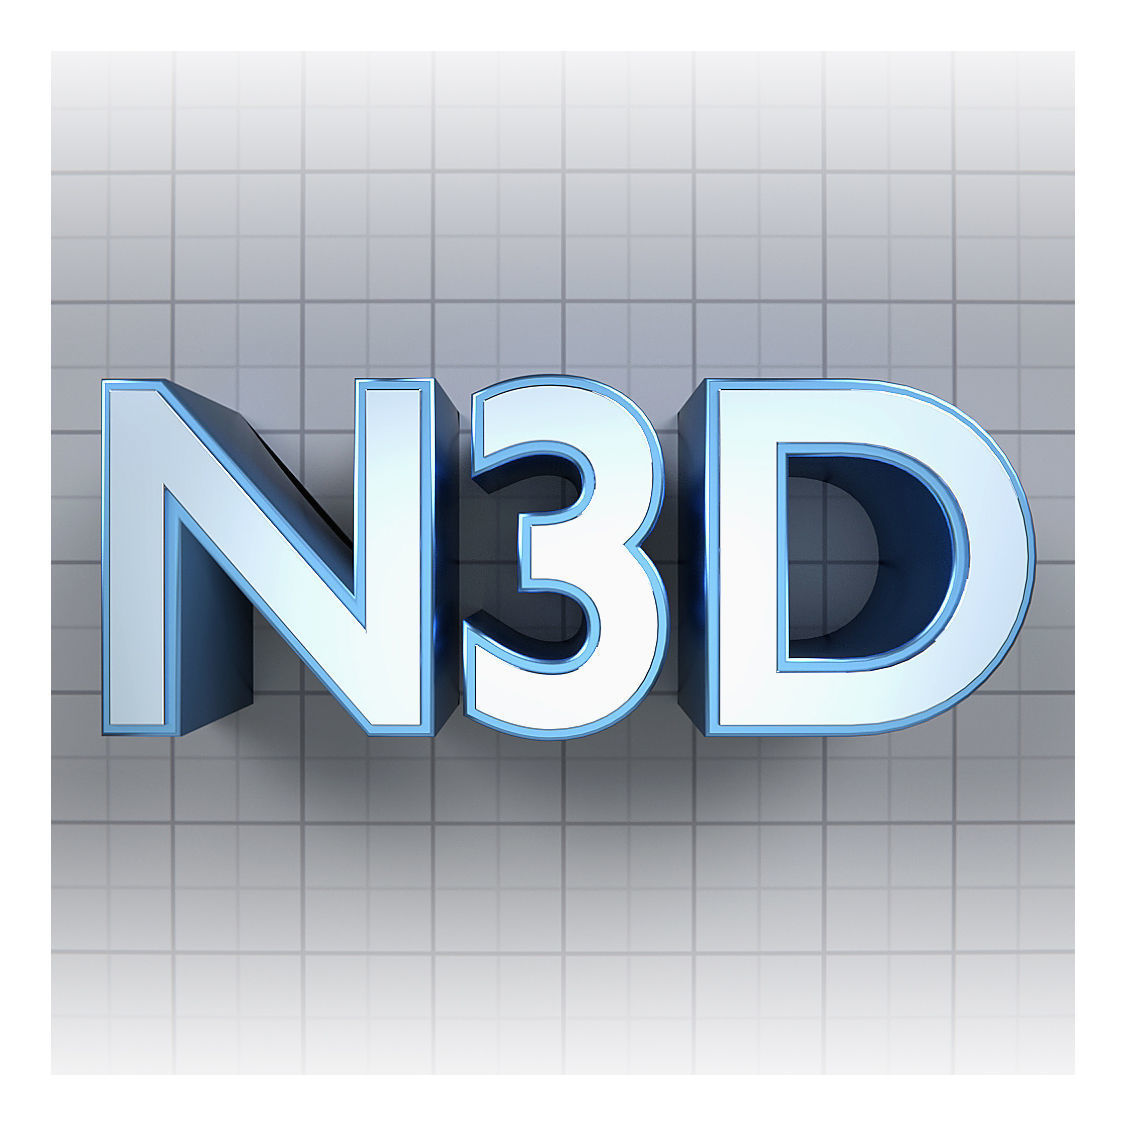 Nik3D